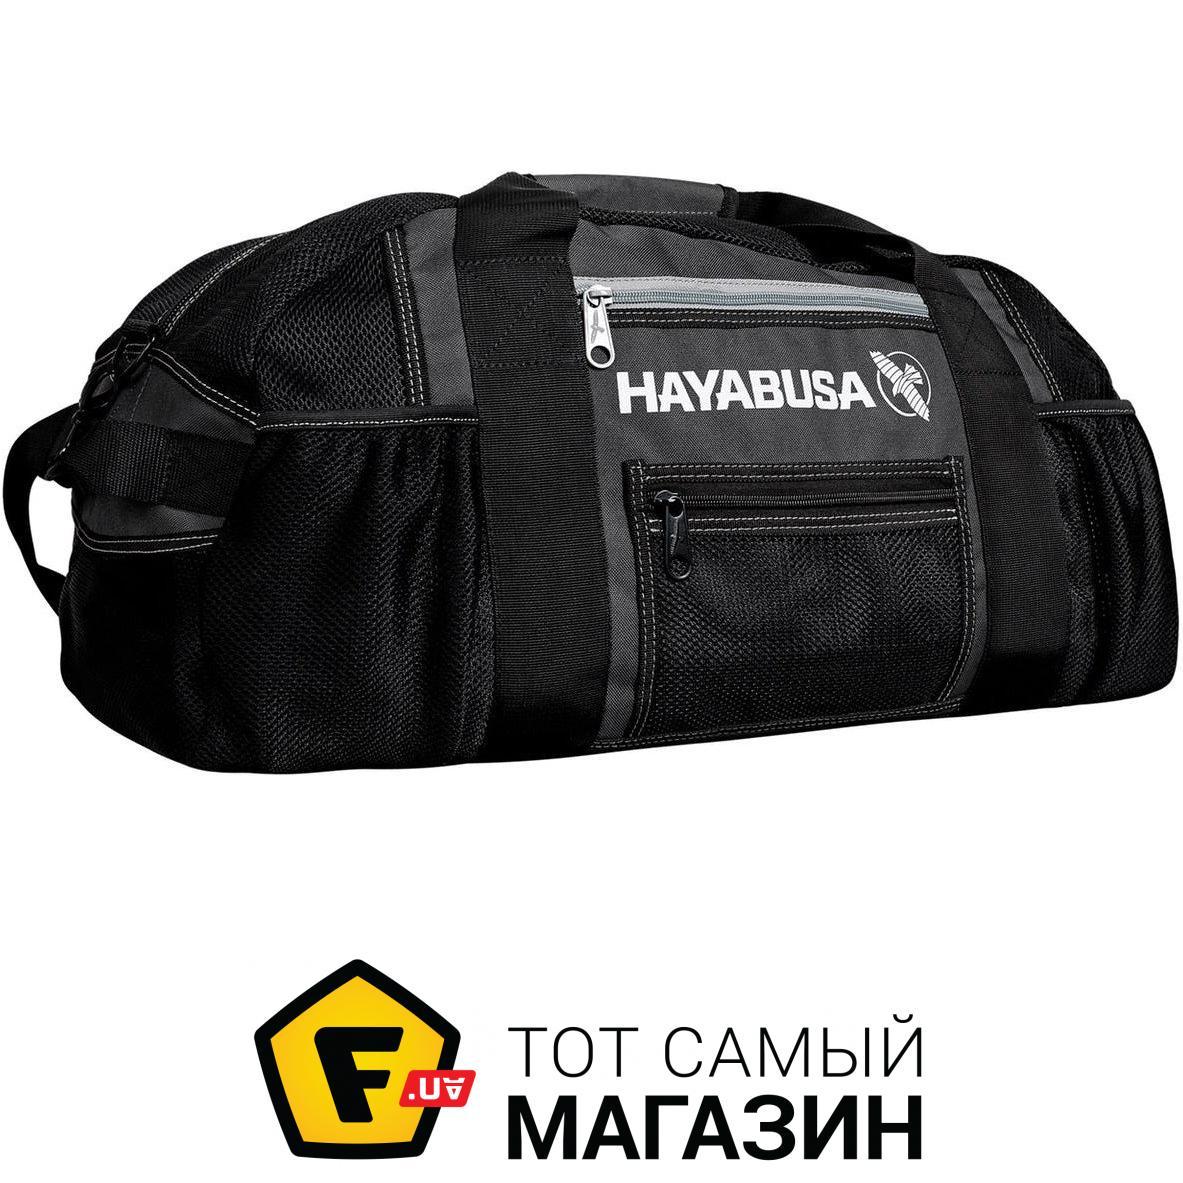 0bd939a6774b ᐈ HAYABUSA Ryoko Mesh Gear Bag черный/серый ~ Купить? ЦЕНА Снижена ...